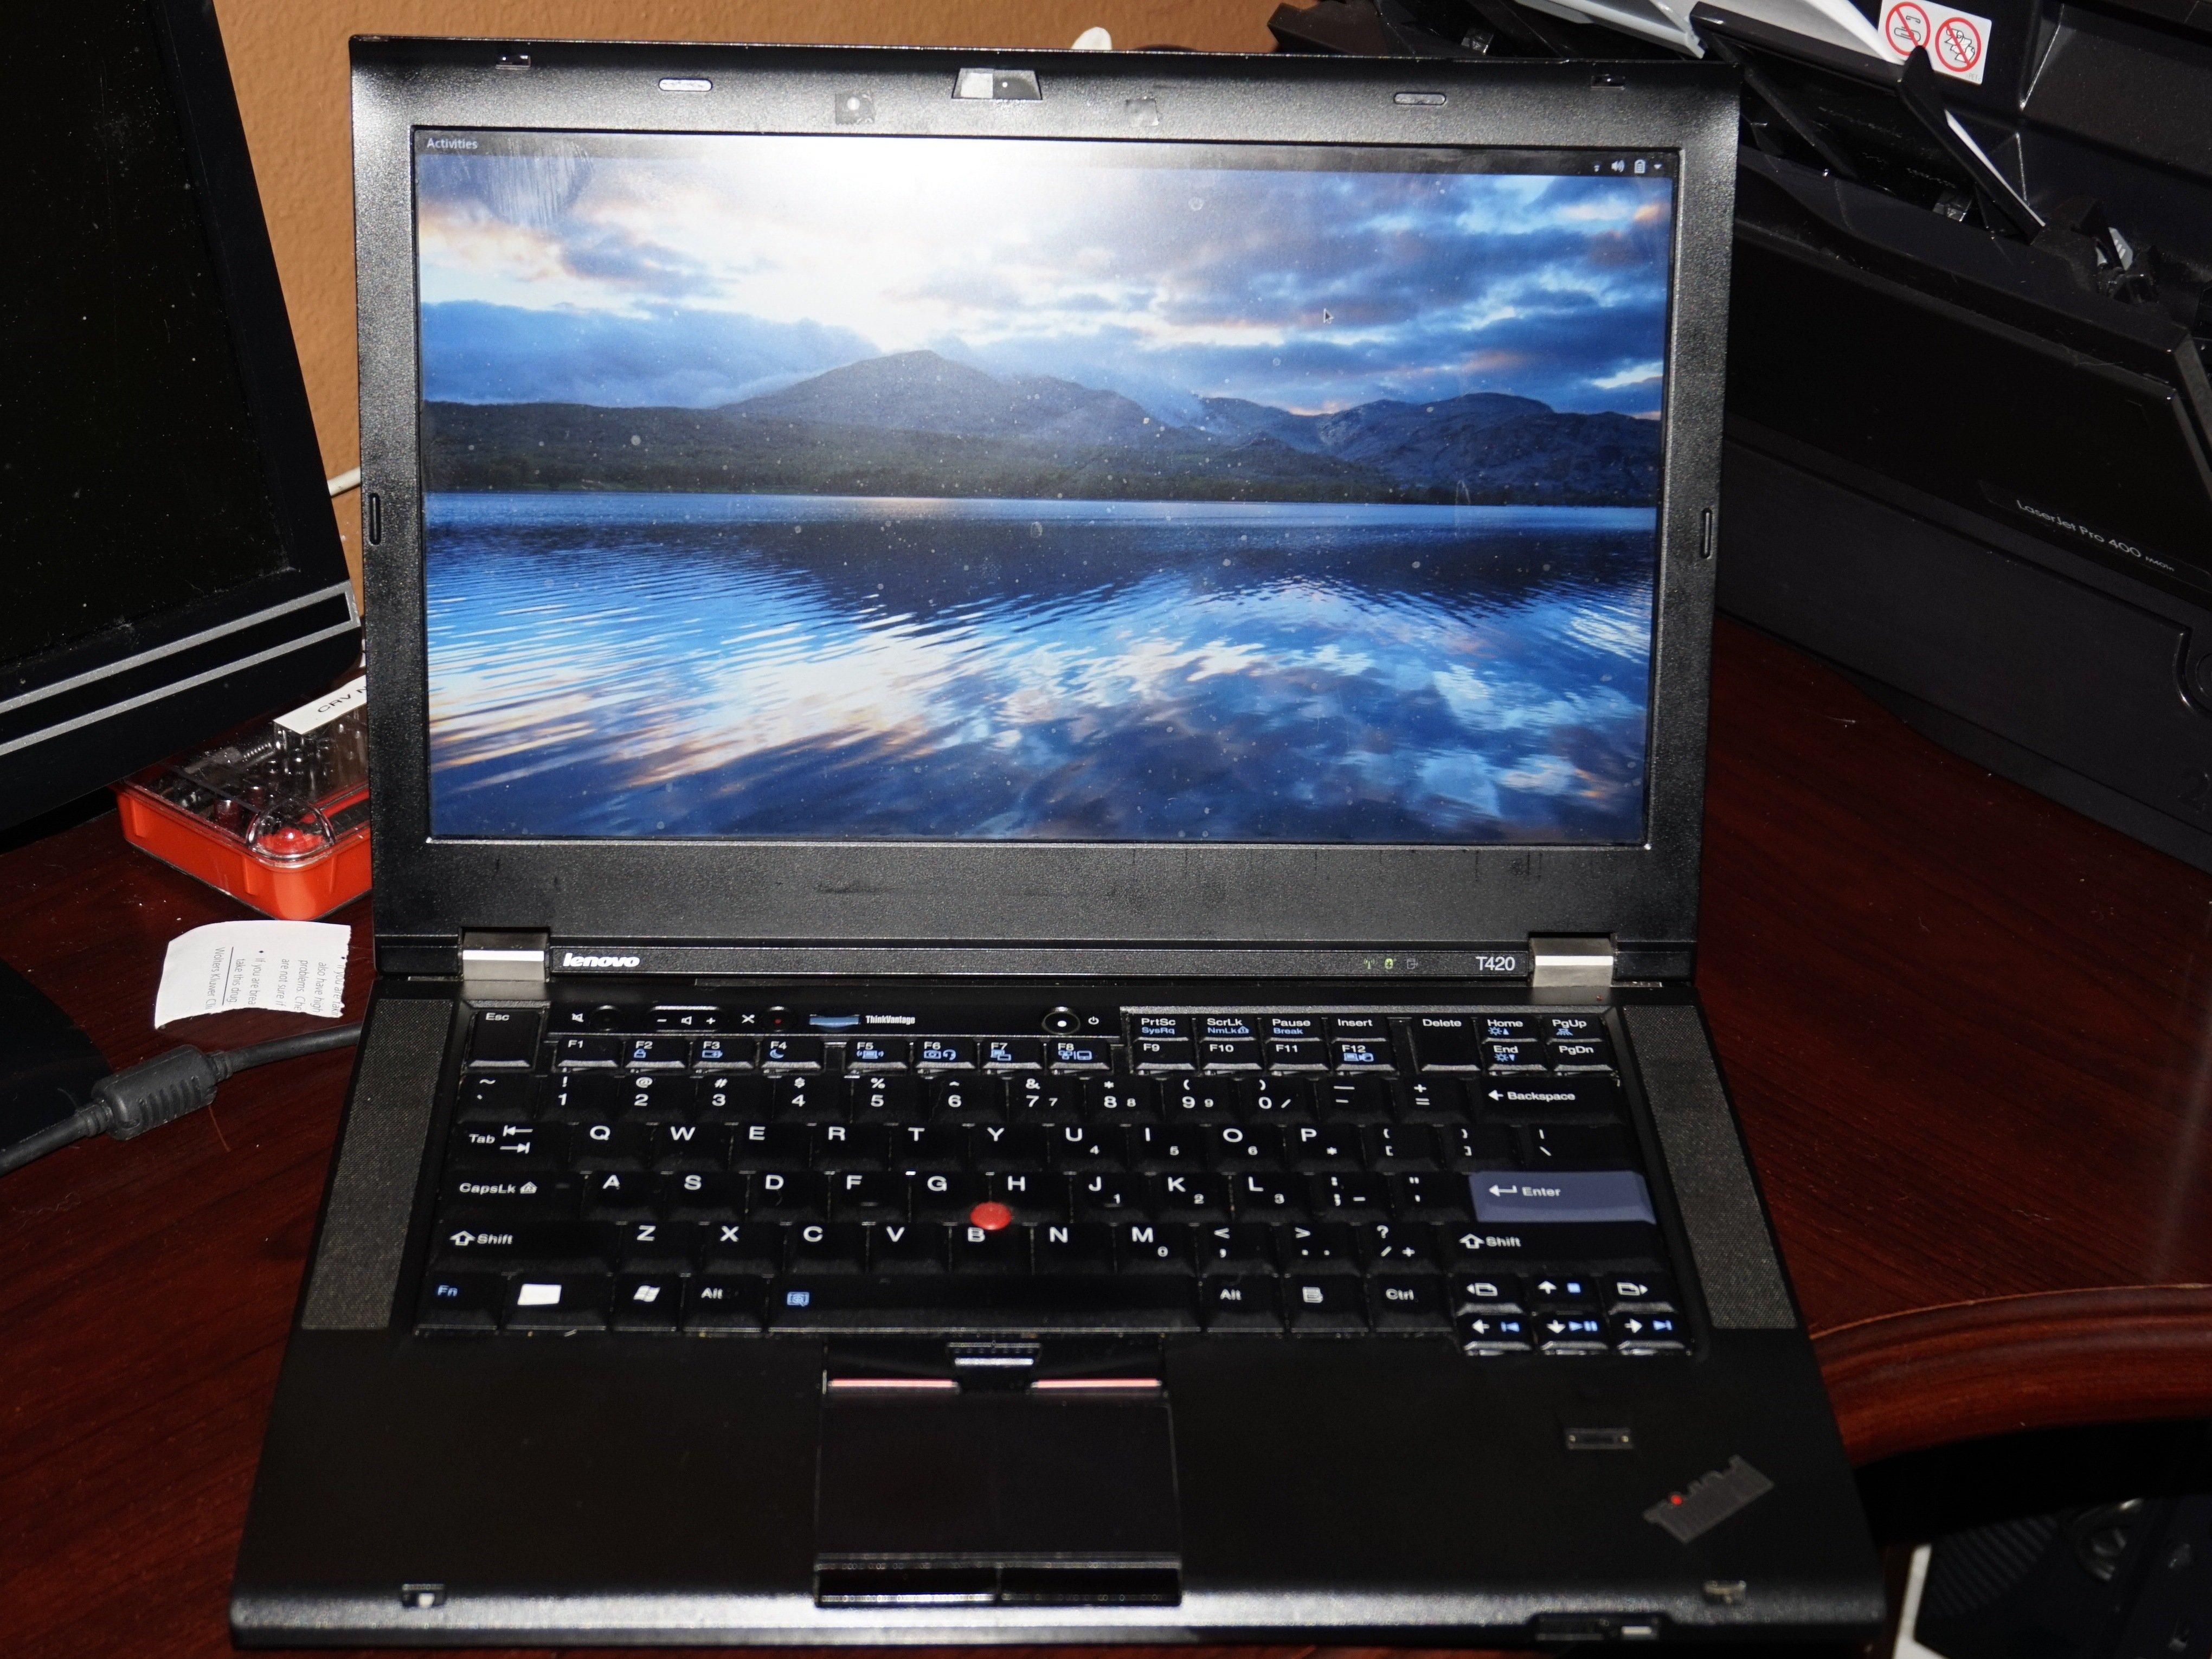 Archived) Linux machine Configuration (Laptop 2008-2012) (2008, 2009